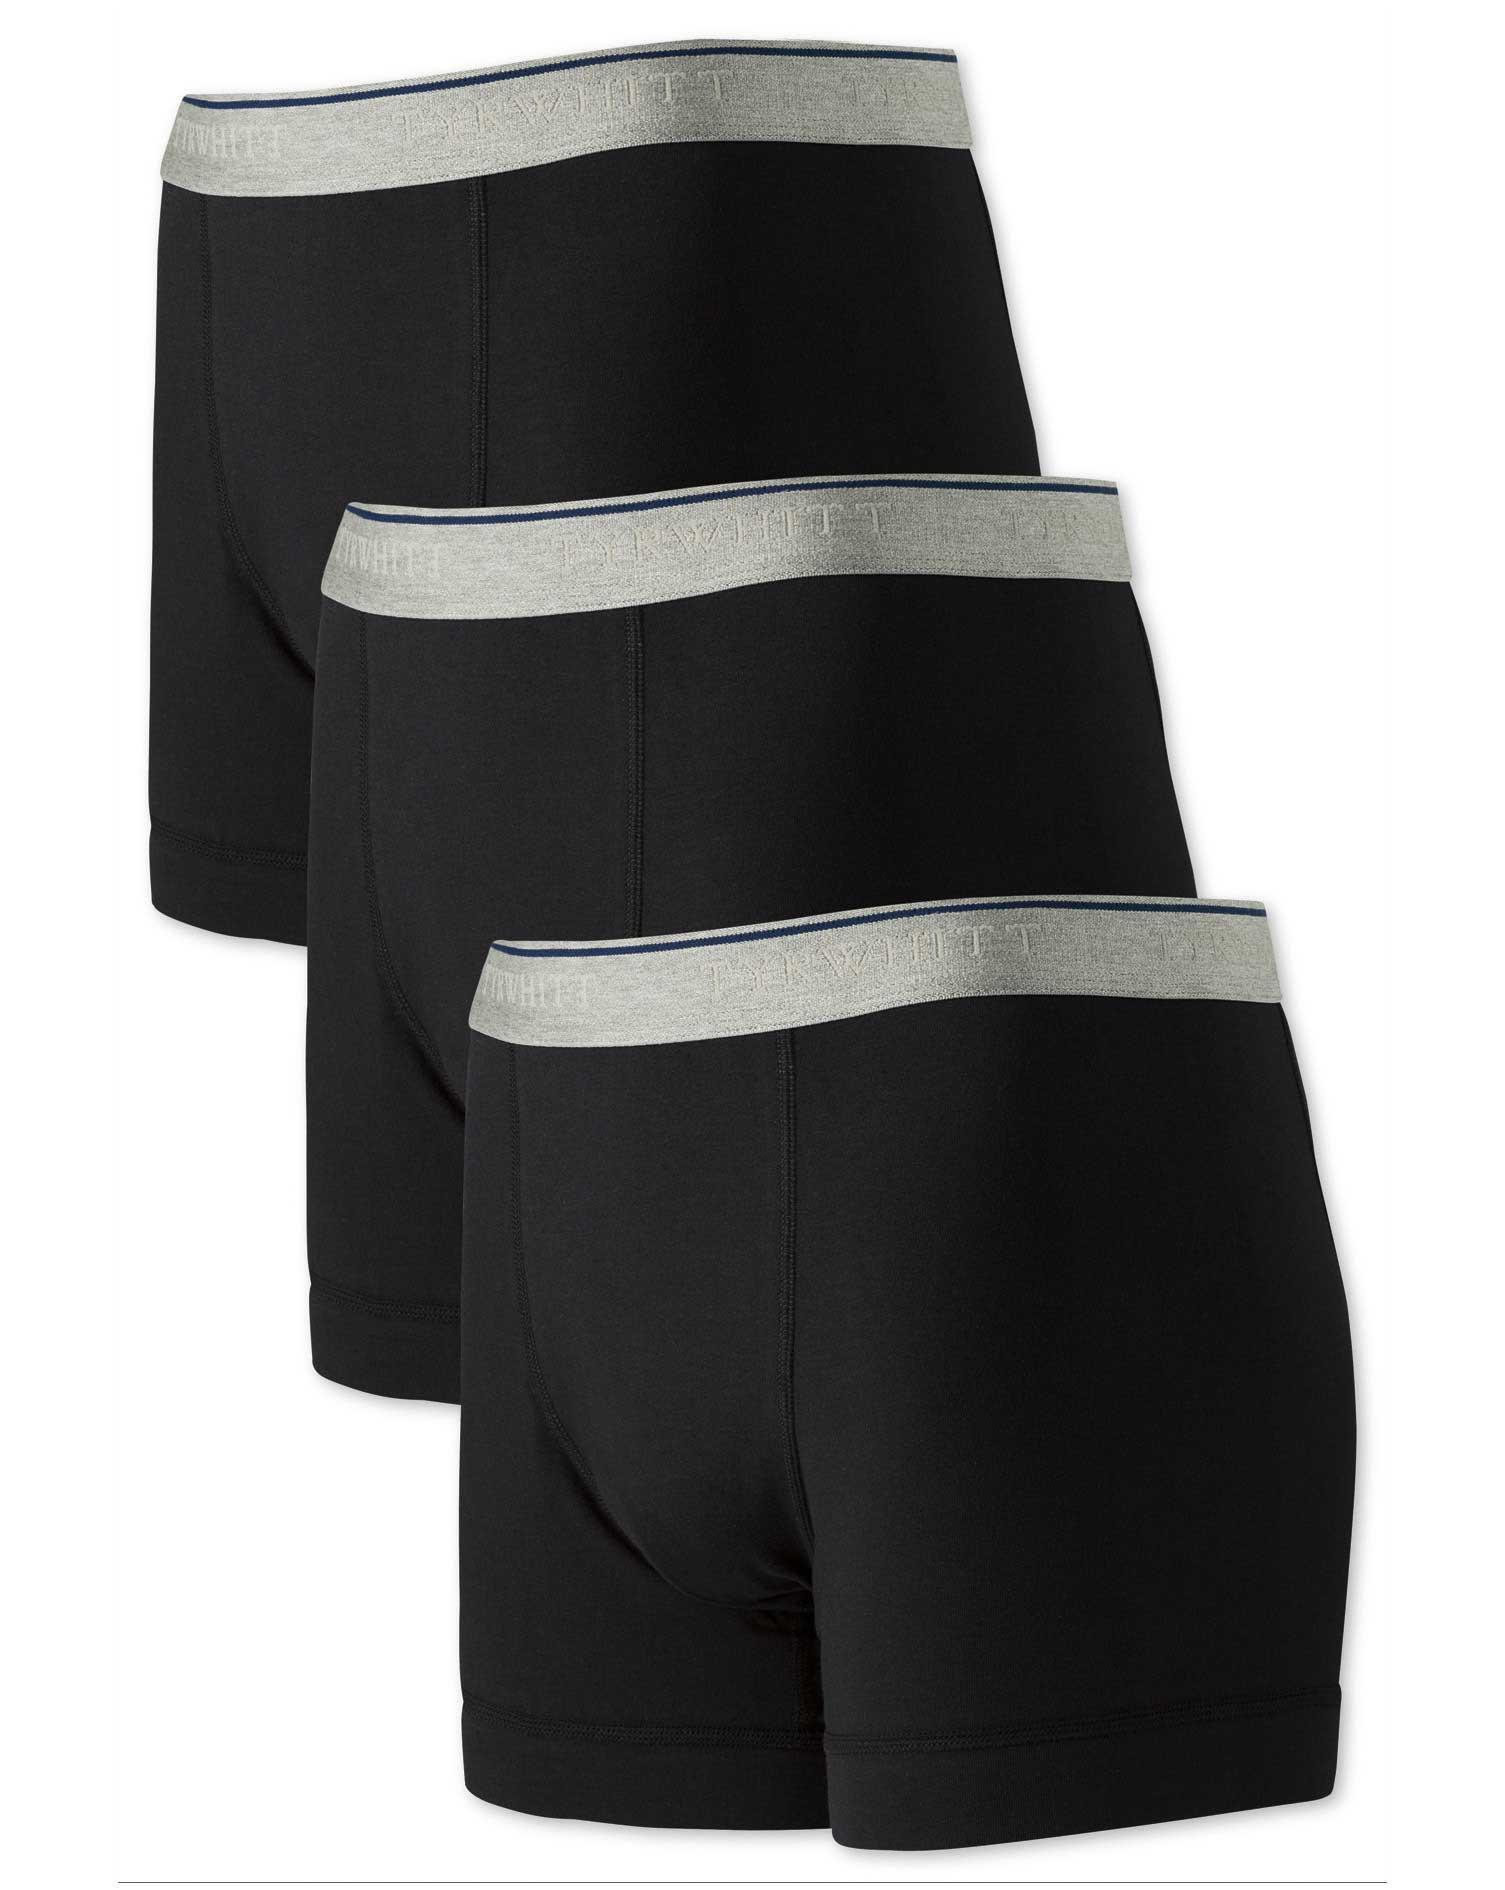 Black Jersey 3 Pack Trunks Size XS by Charles Tyrwhitt